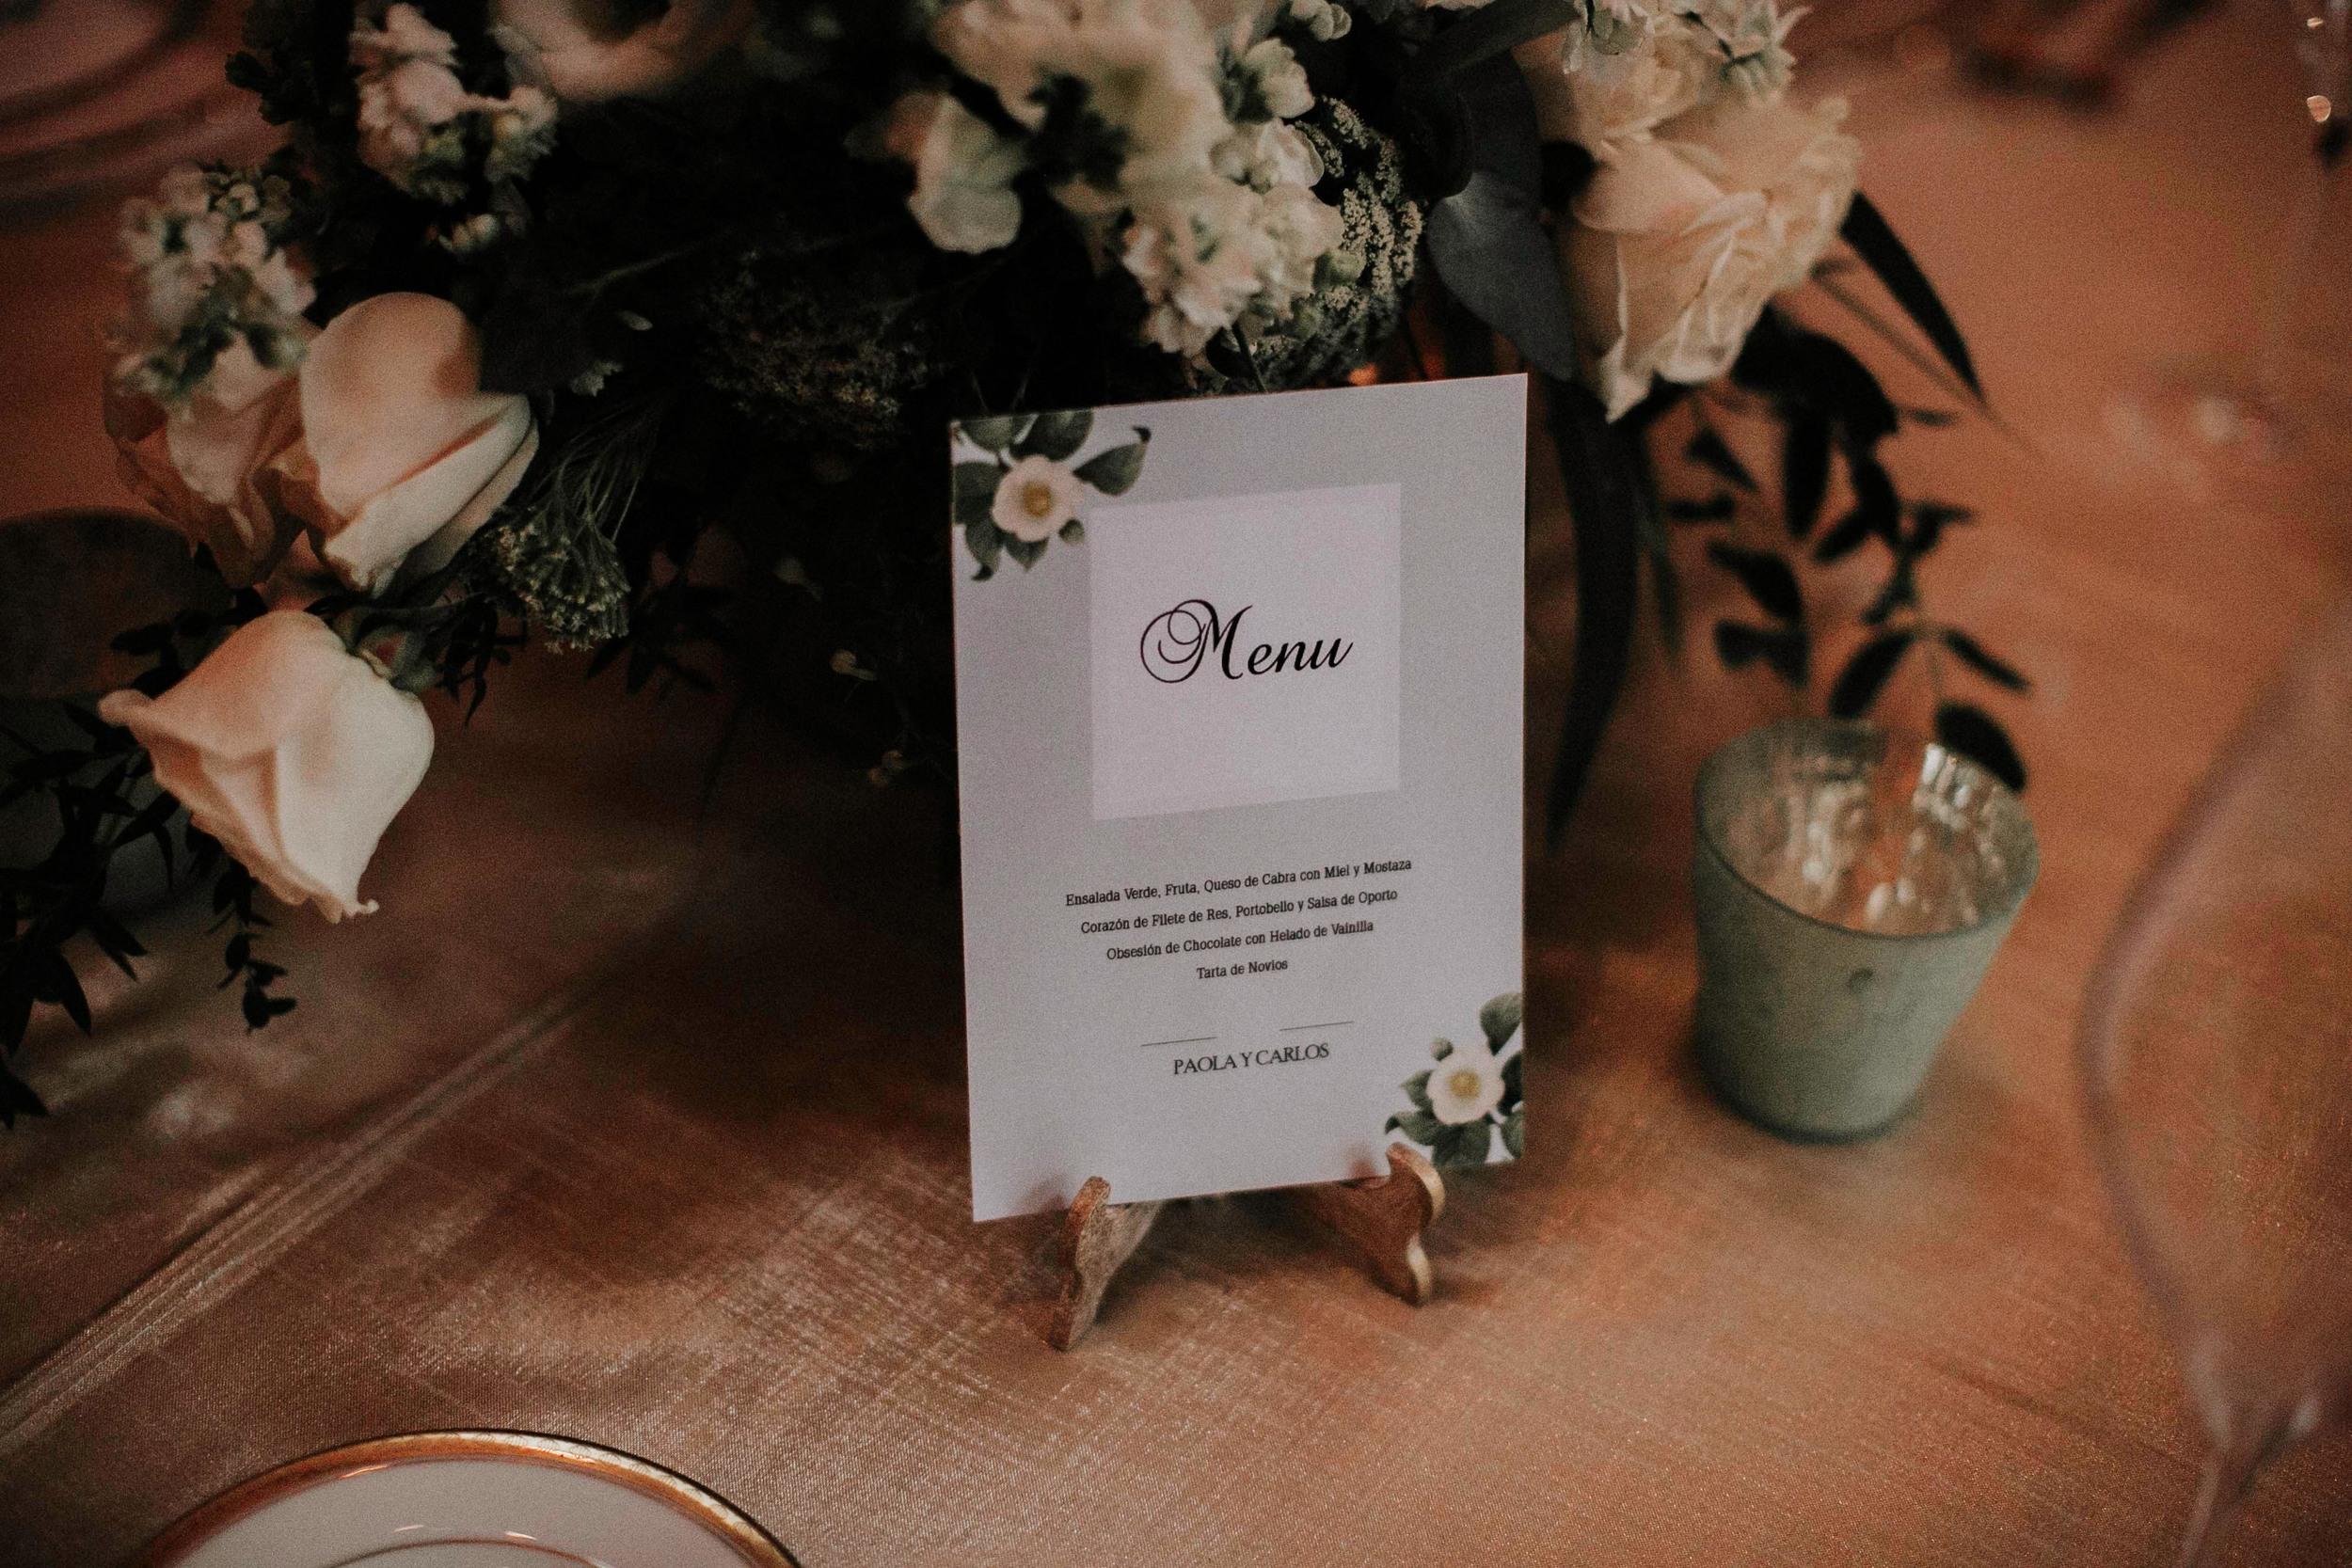 DJ8A8905-Editaralfonso_flores_destination_wedding_photographer_San_gabriel_de_las_palmas.jpg